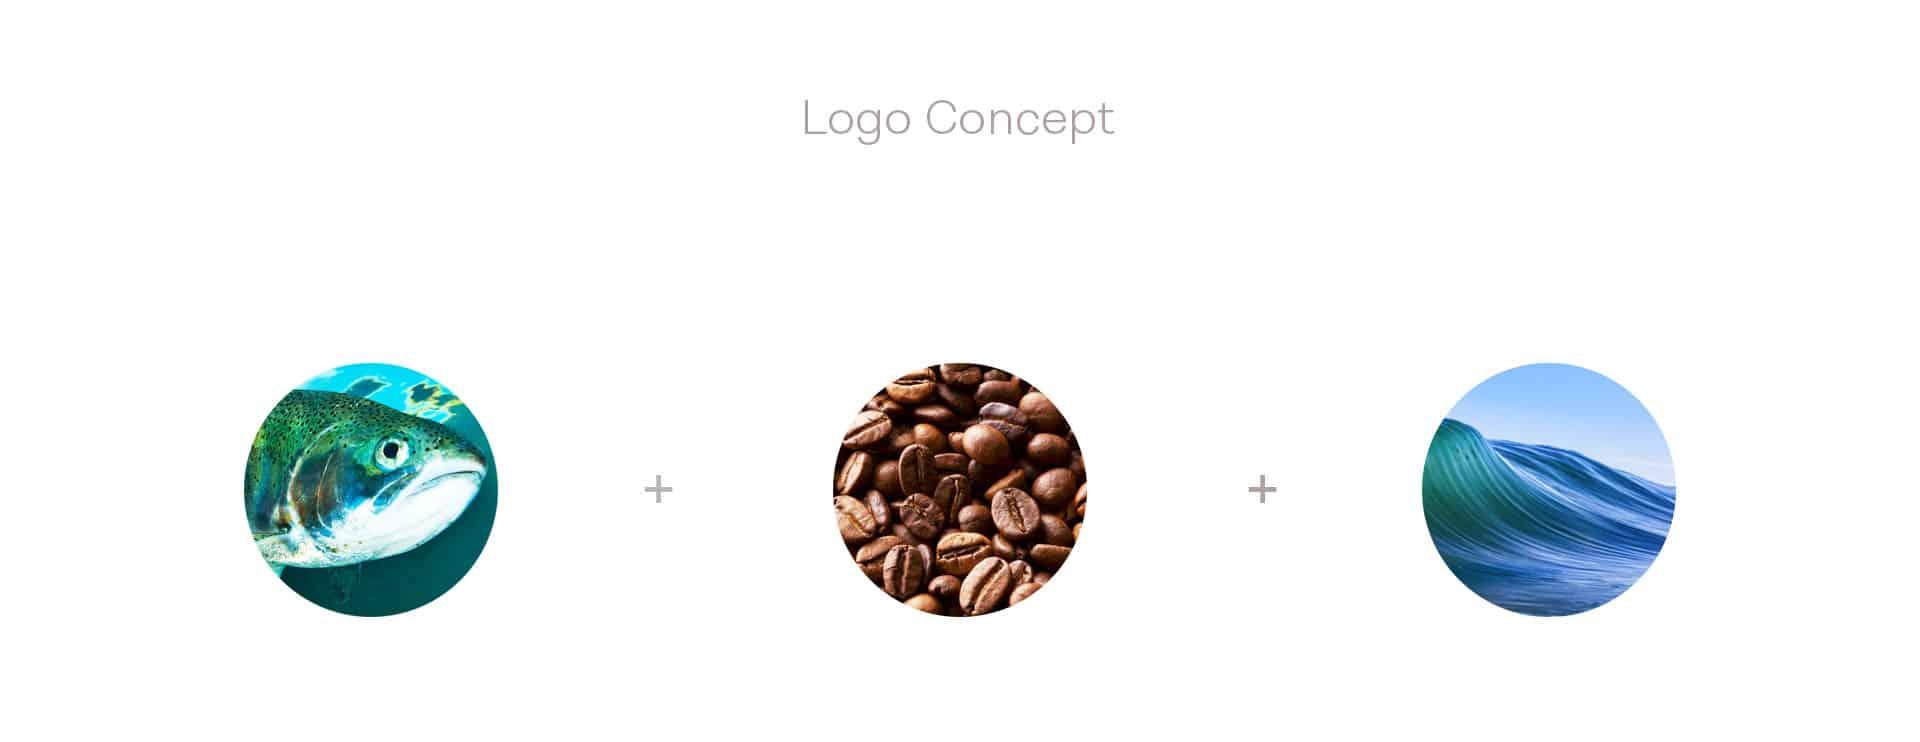 Logo Design Concept and Idea